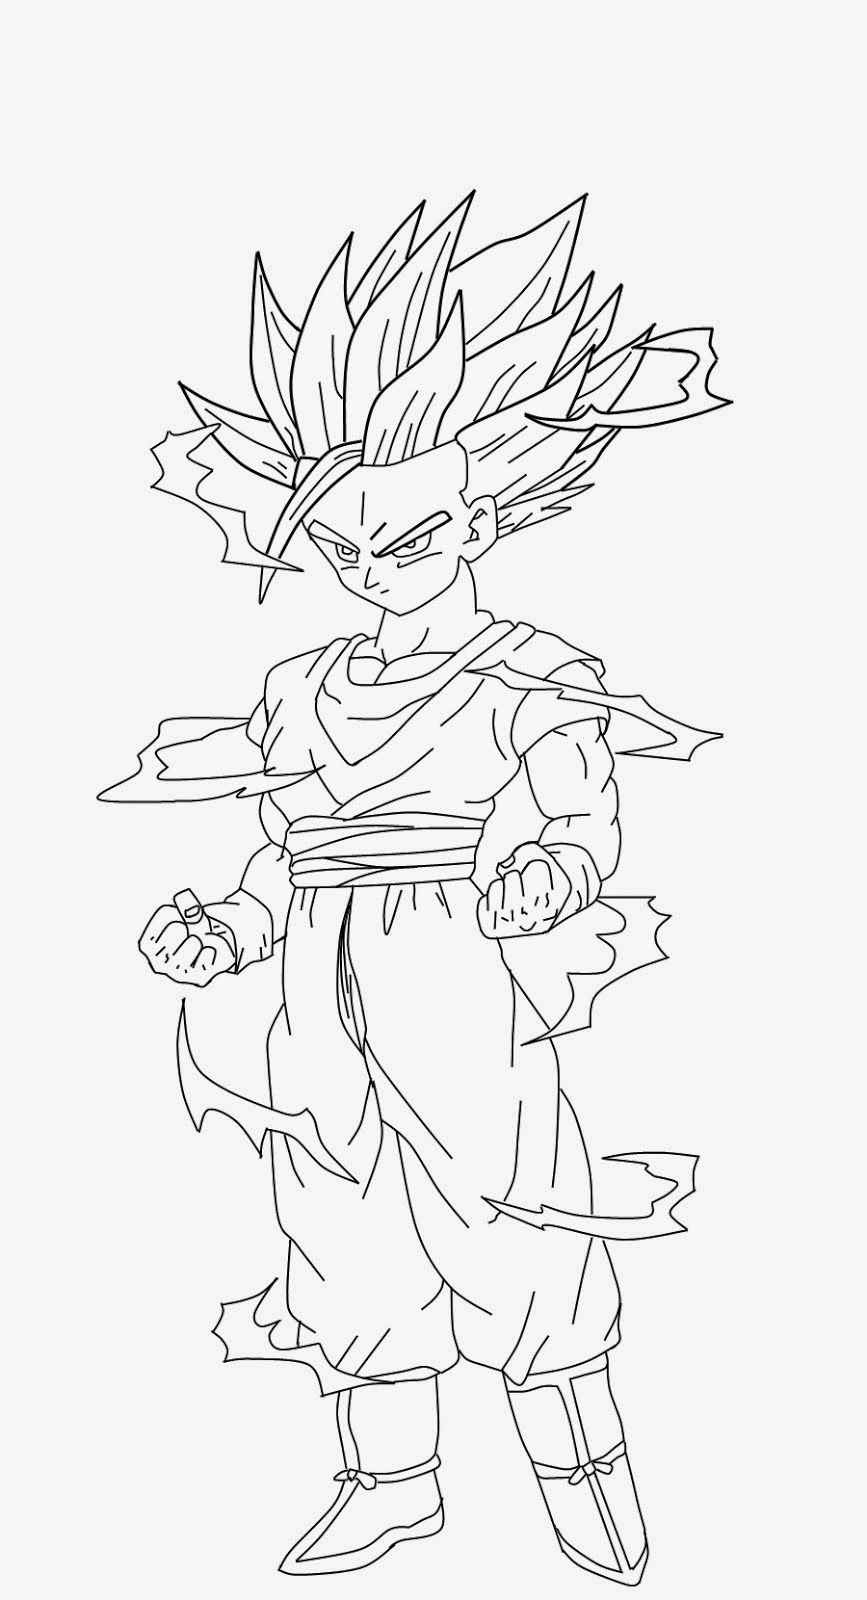 BAÚ DA WEB: Desenhos de Dragon Ball Z para colorir, pintar, imprimir ...